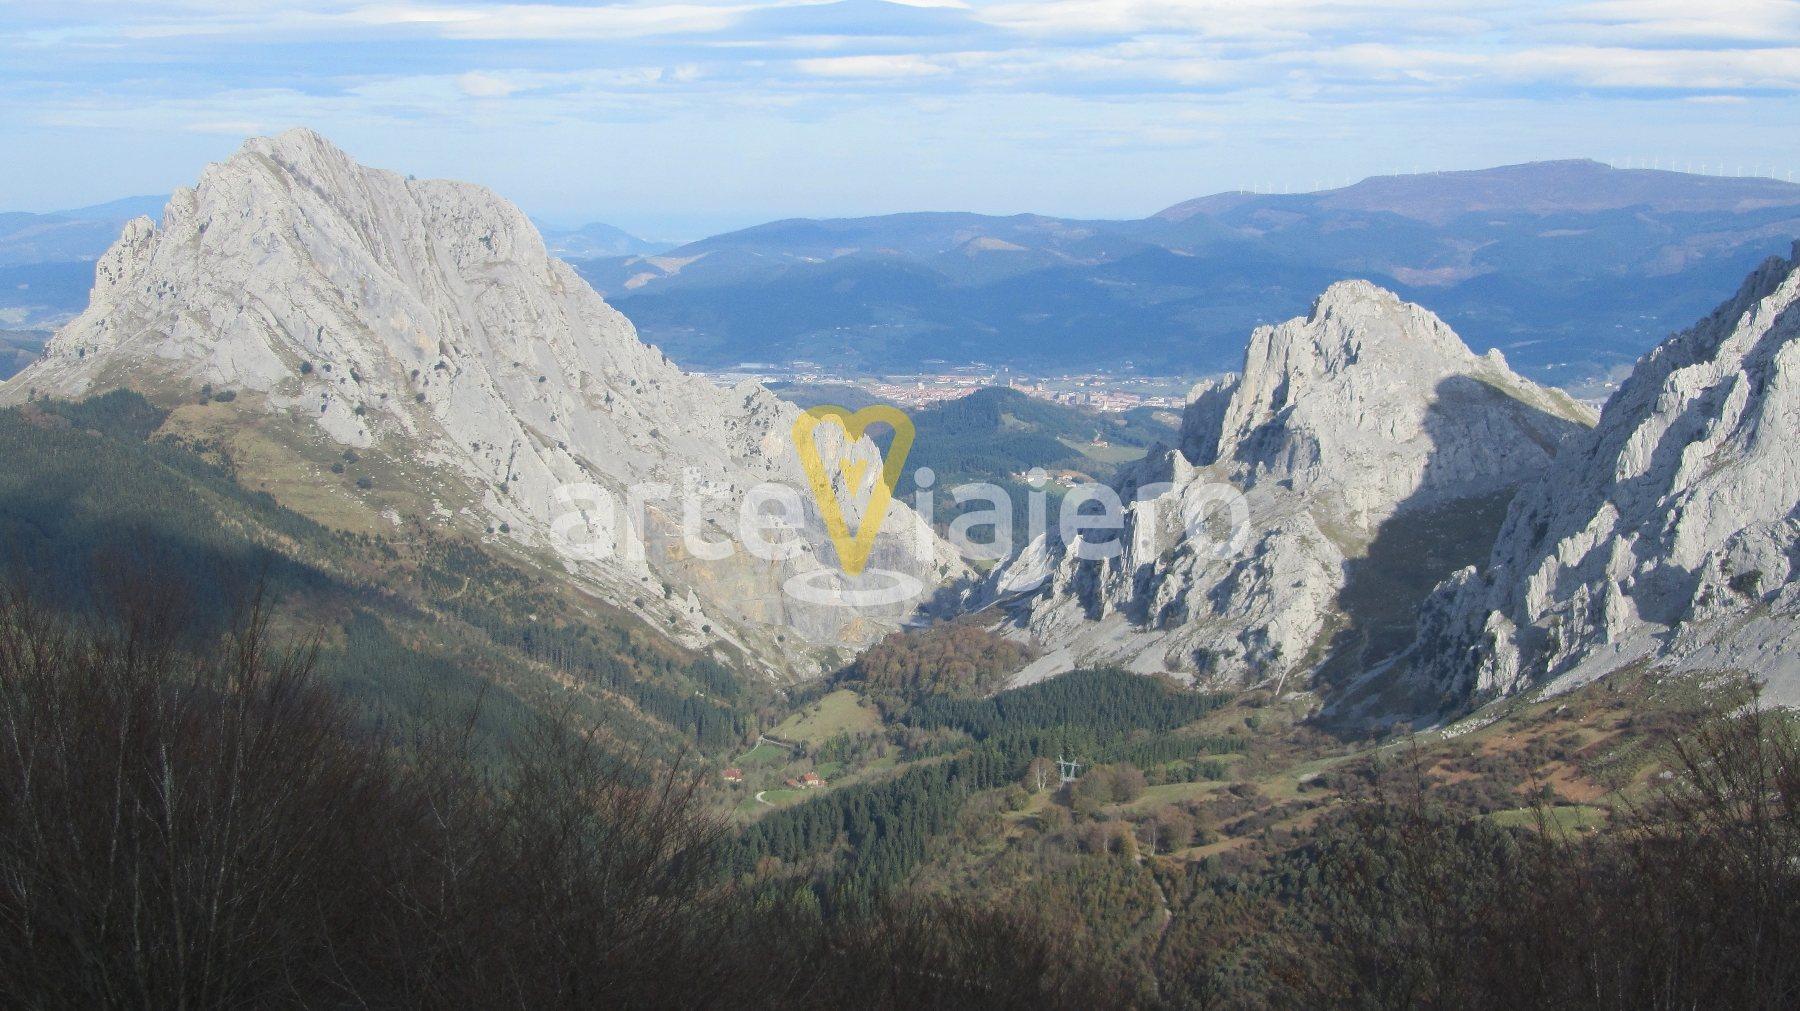 montes de urkiola